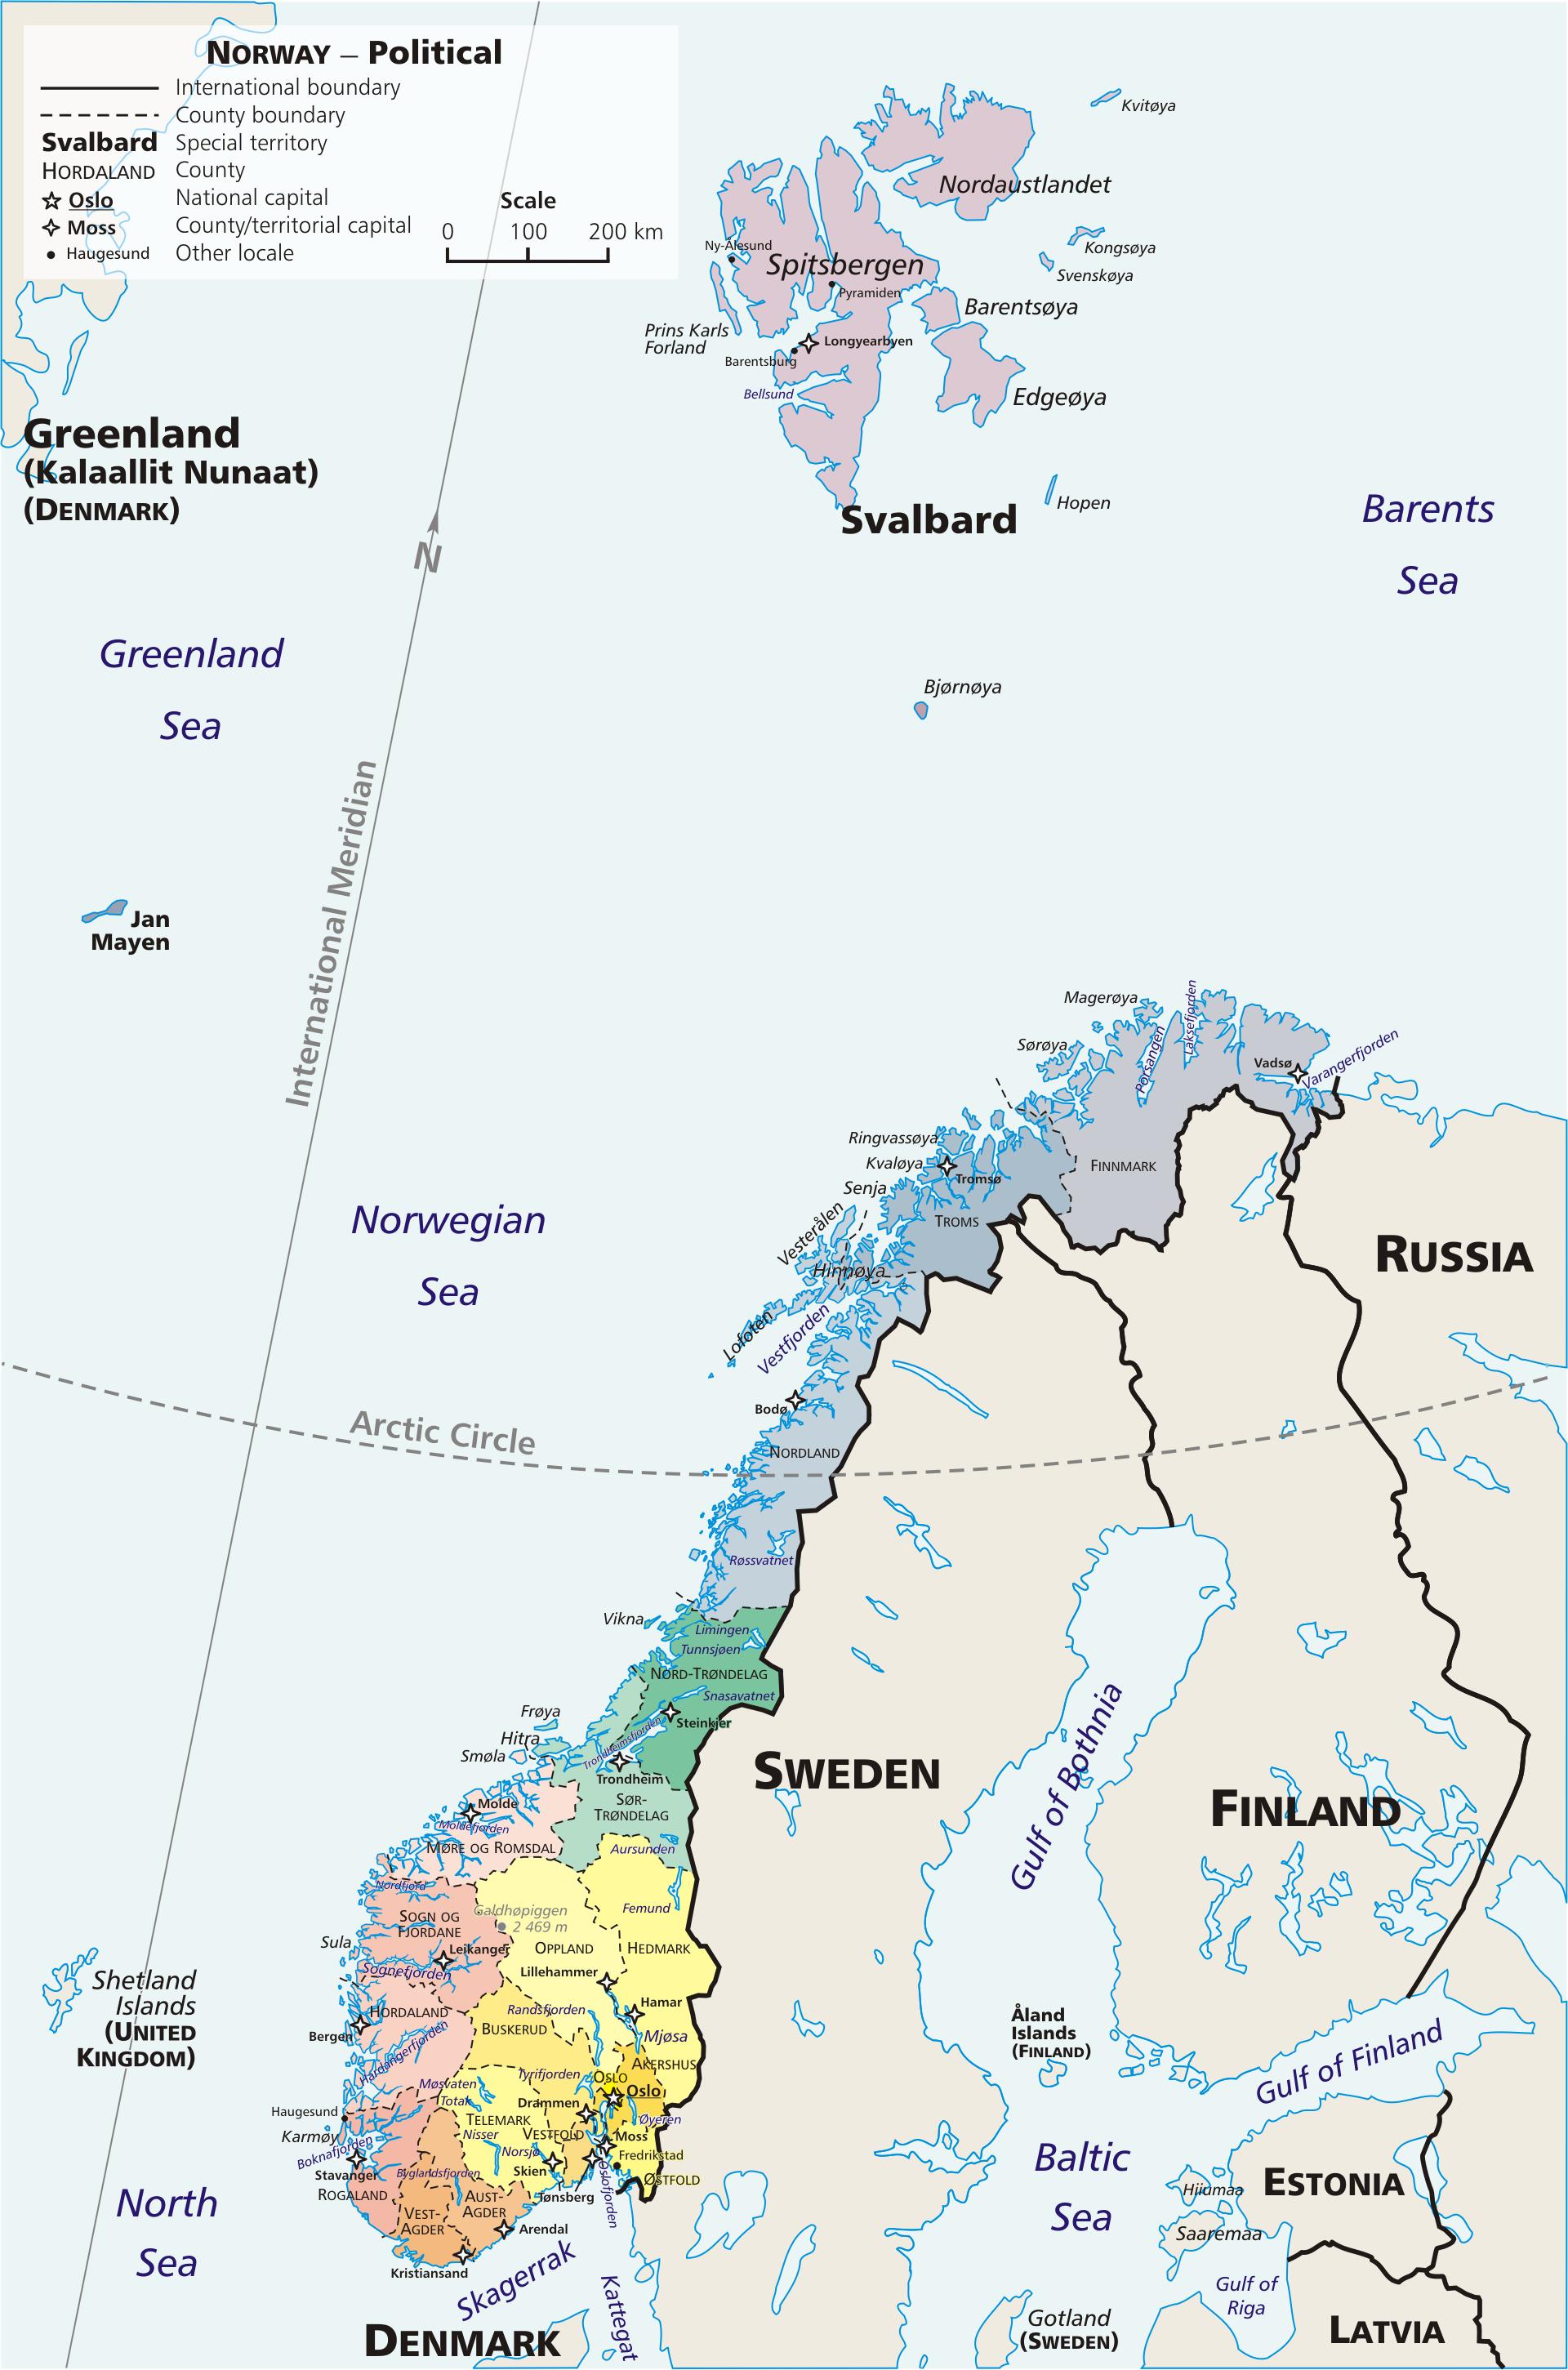 Karte Südnorwegen.Landkarte Norwegen Verwaltungsbezirke Weltkarte Com Karten Und